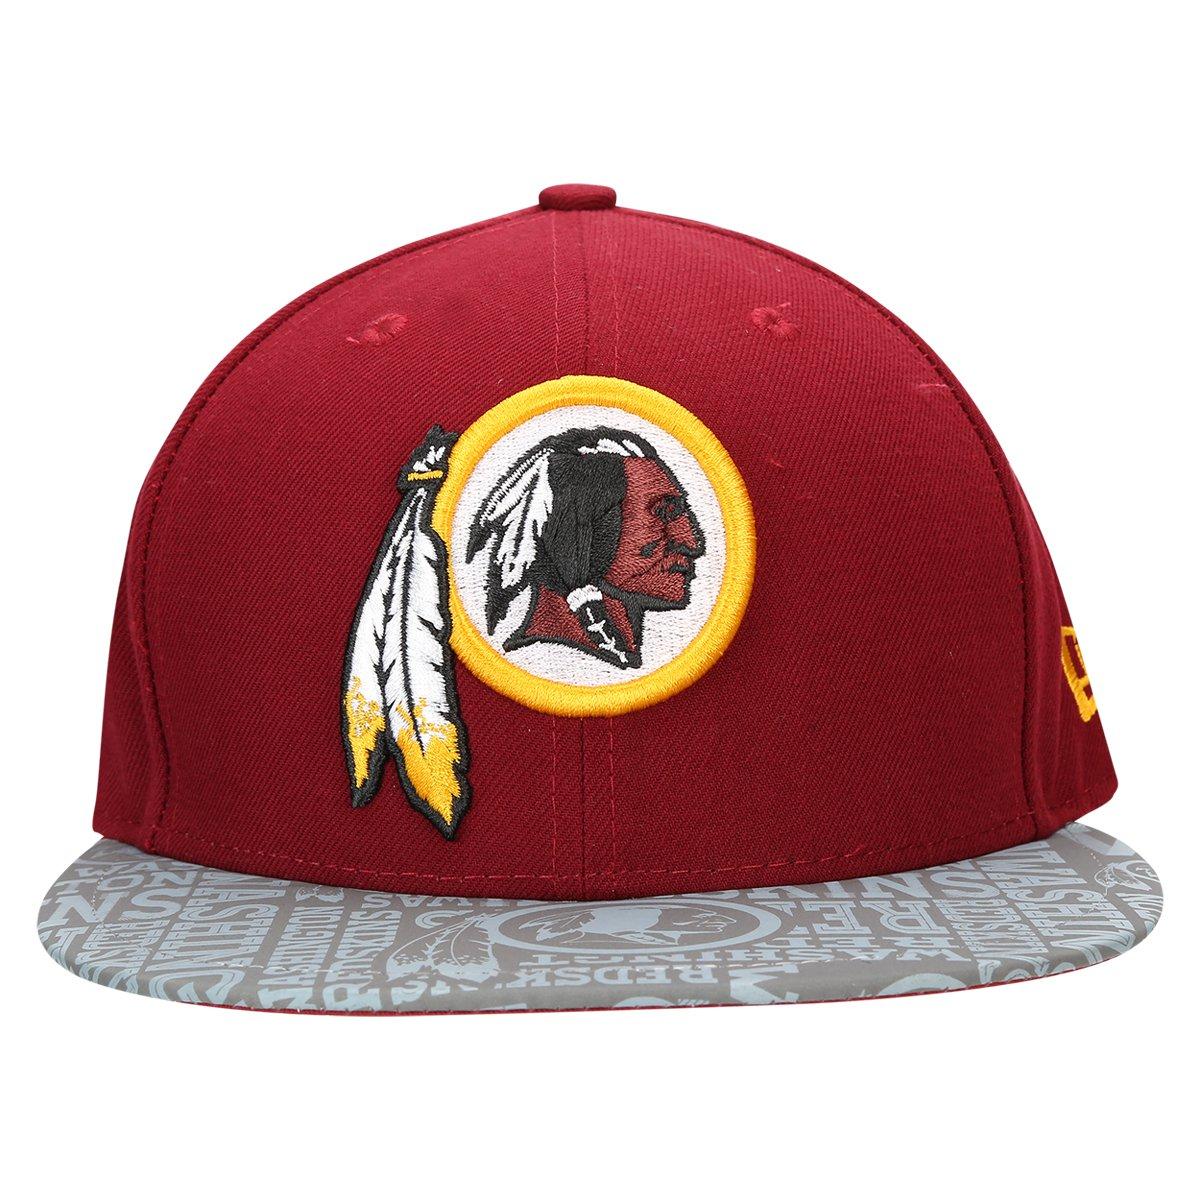 Boné New Era 5950 NFL Official Draft Washington Redskins - Compre ... b1bb46f79d9